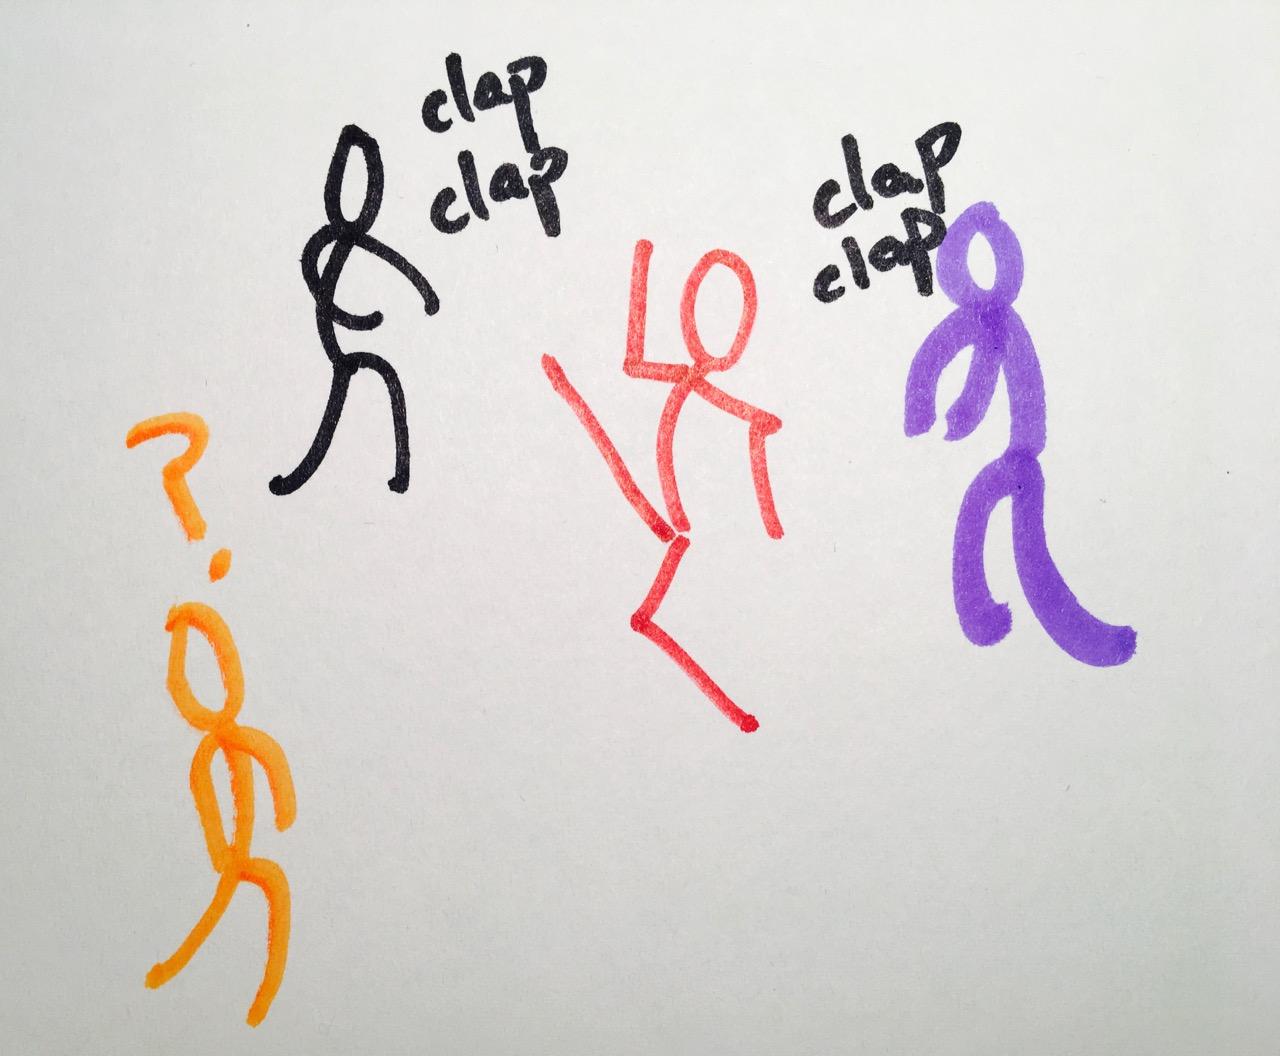 4 dancers